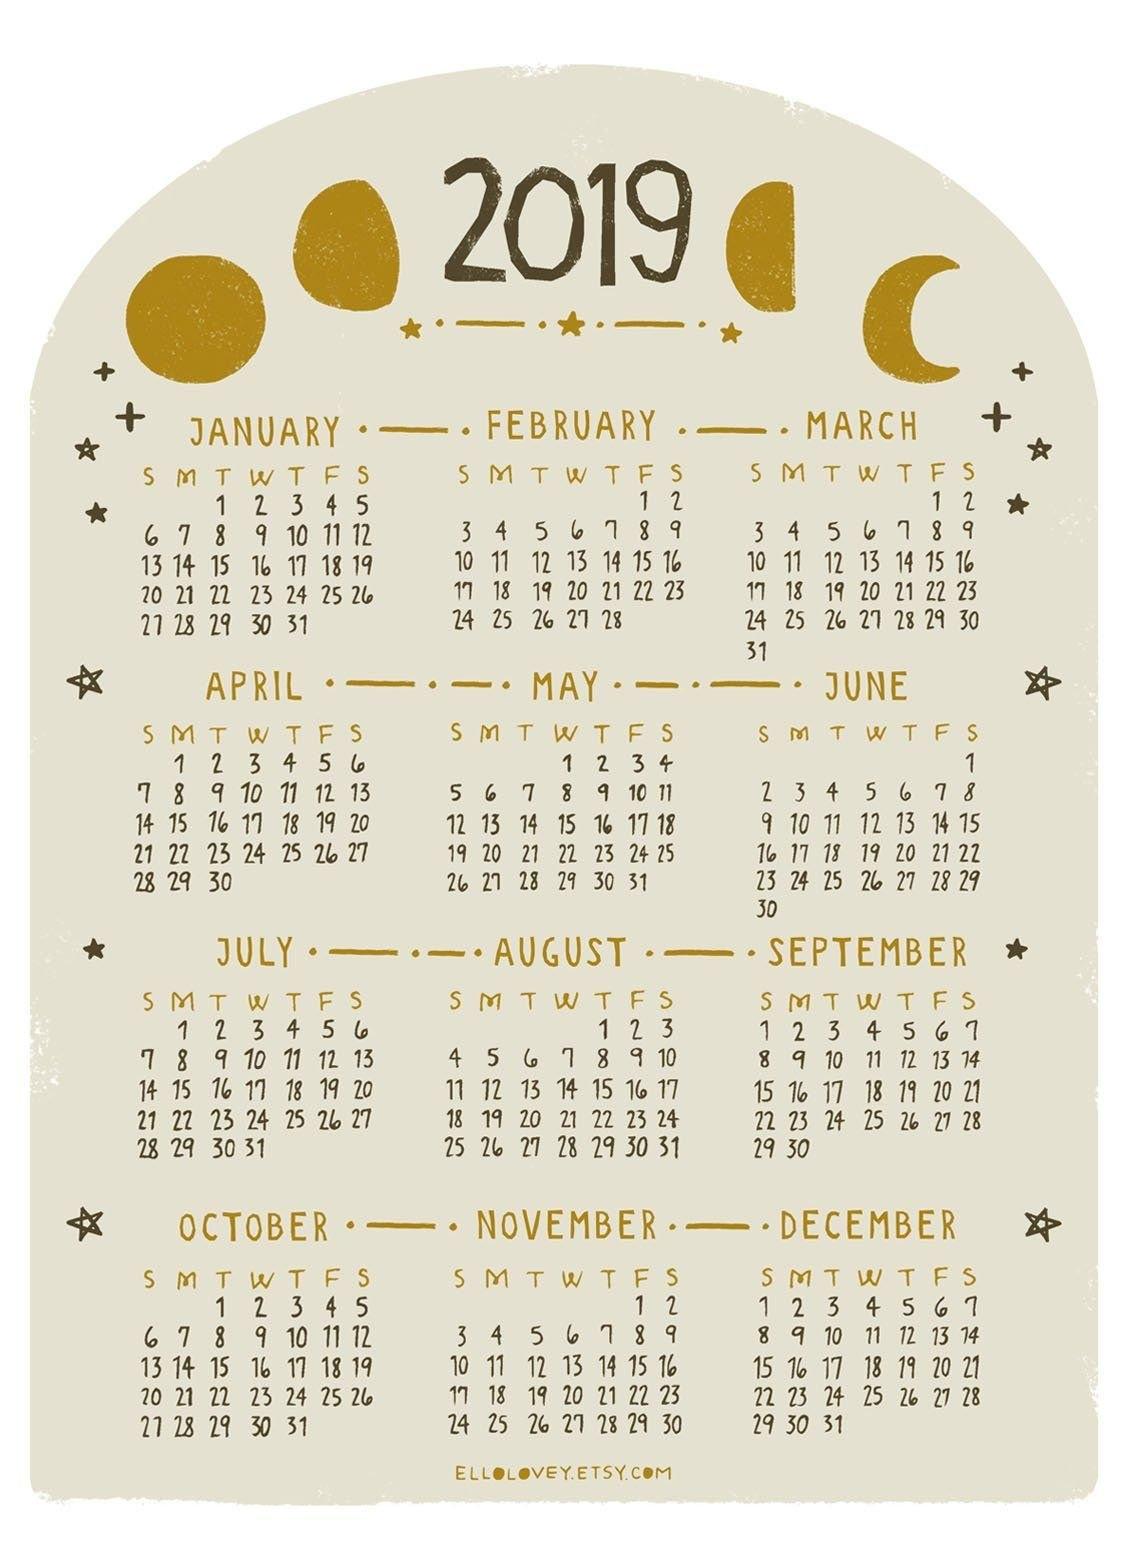 2019 Mini Moon Calendar | Etsy | Calendar | Calendar, Moon Calendar Calendar 2019 Etsy